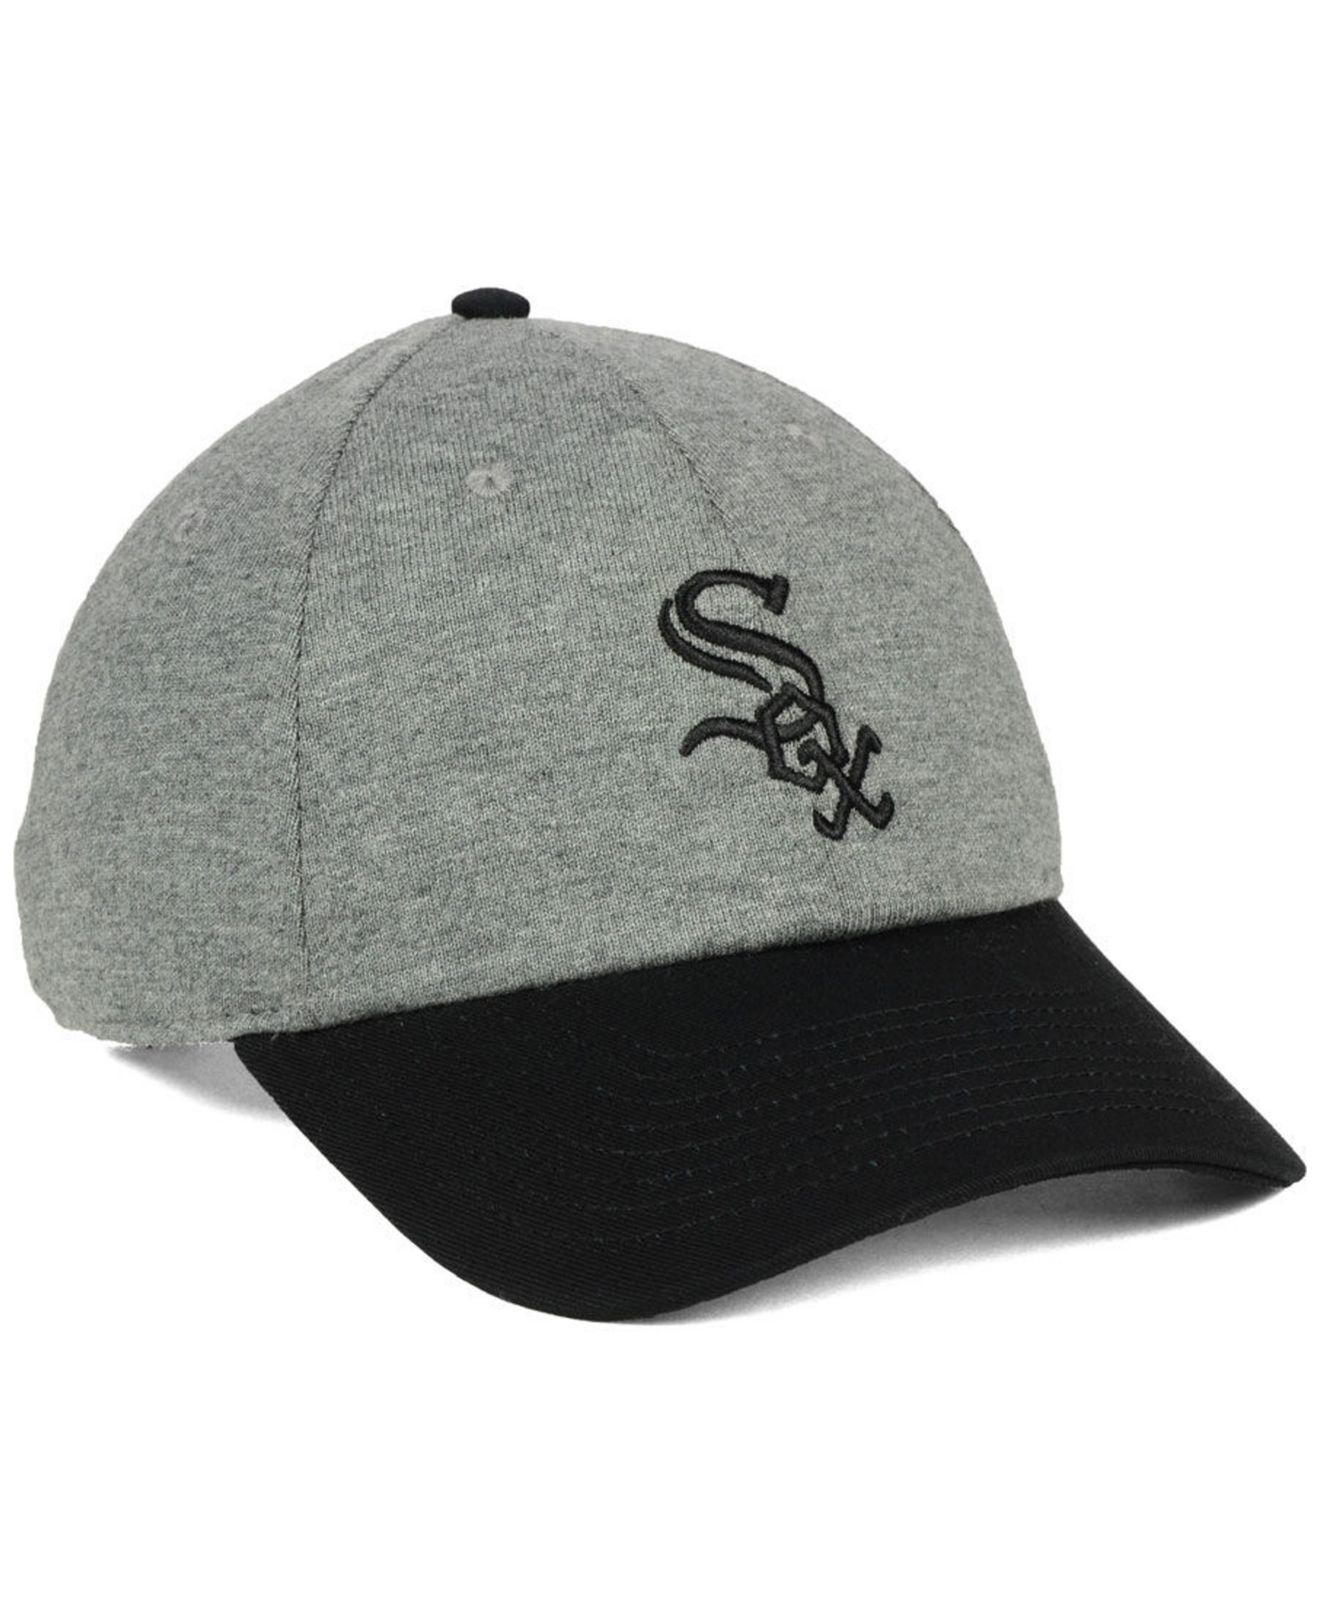 promo code a8d26 cc7ee ... australia nike gray chicago white sox 2 tone heather cap for men lyst.  view fullscreen